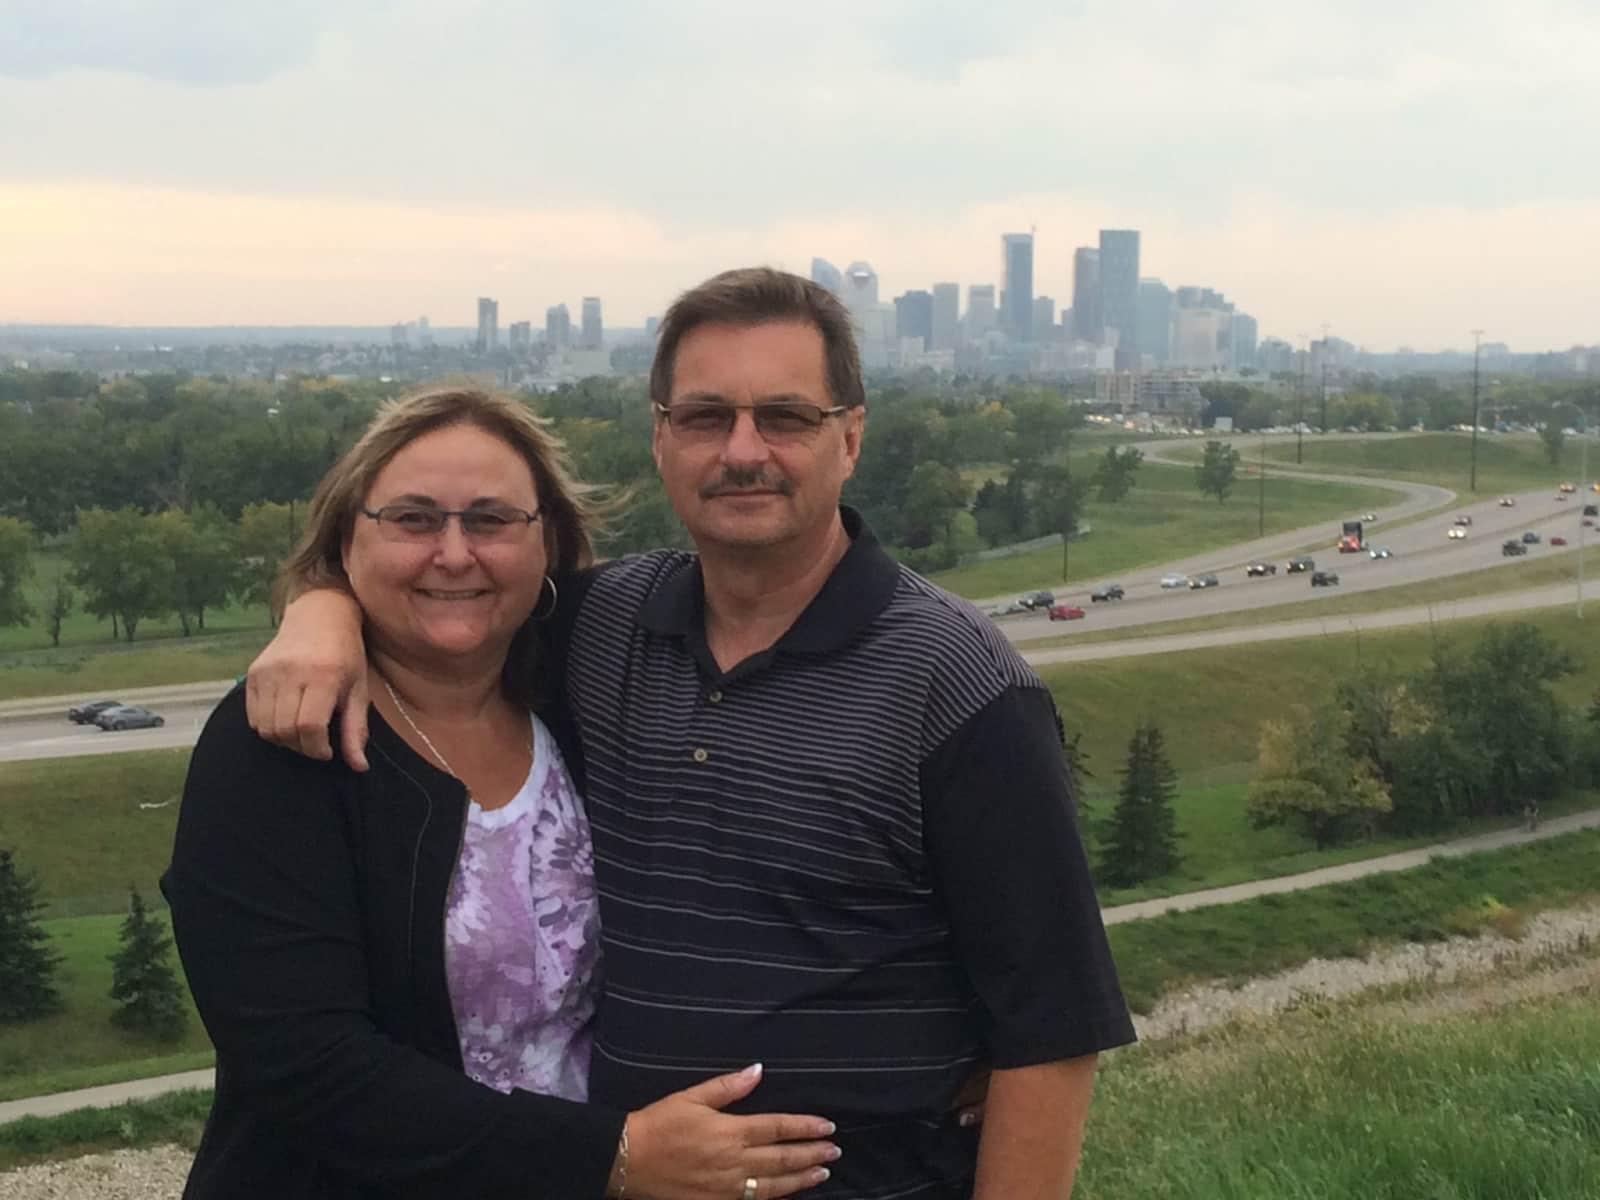 Deborah & Richard from Winnipeg, Manitoba, Canada